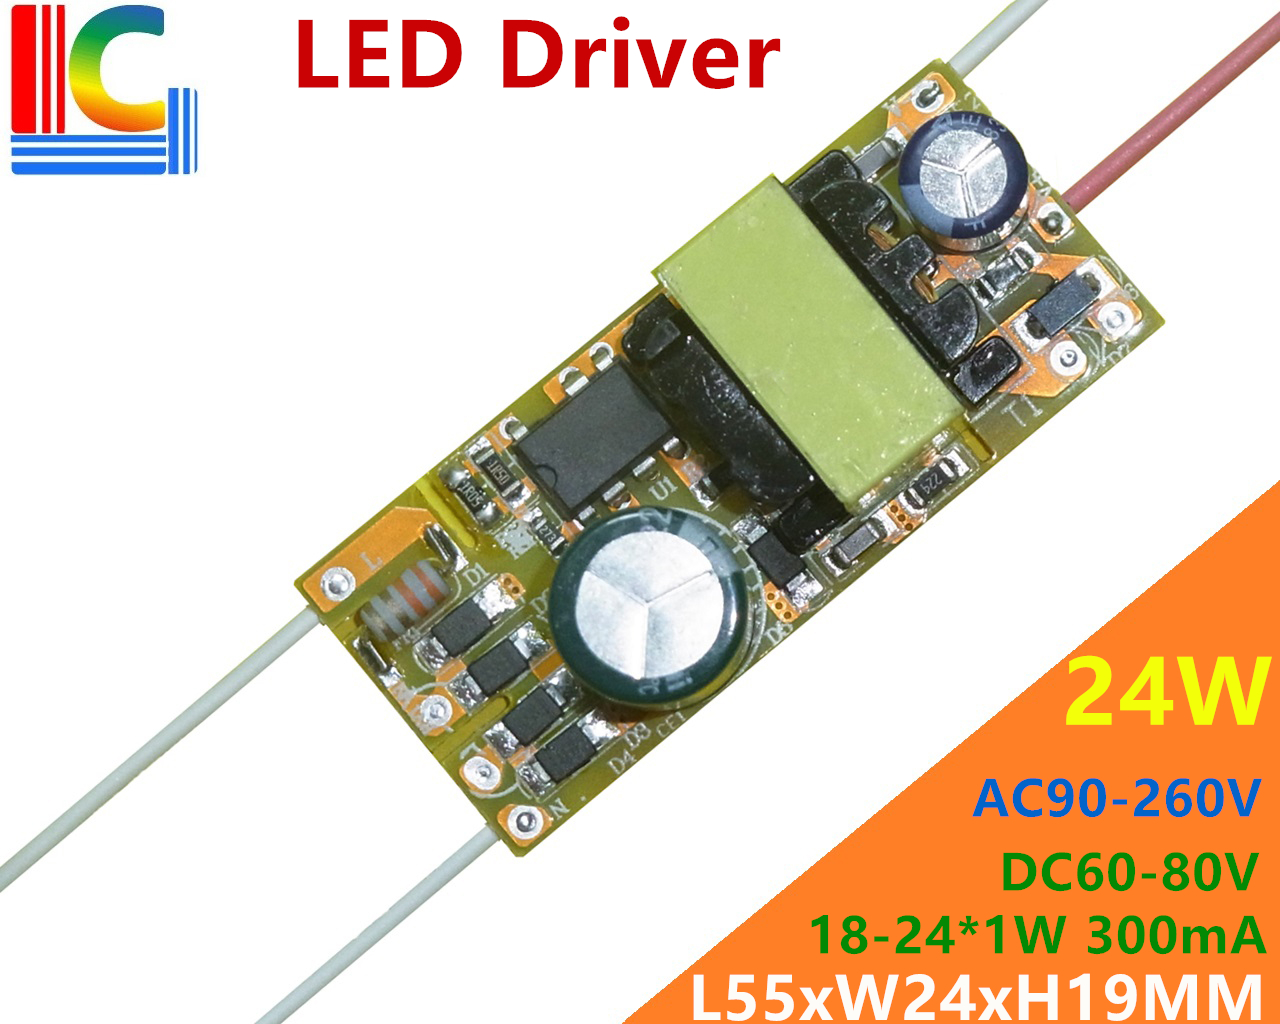 18W 20W 22W 24W Led Driver 300mA 350mA 400mA 500mA 550mA 650mA 700mA Power Supply 85-265VAC To 30-80VDC Lighting Transformer DIY